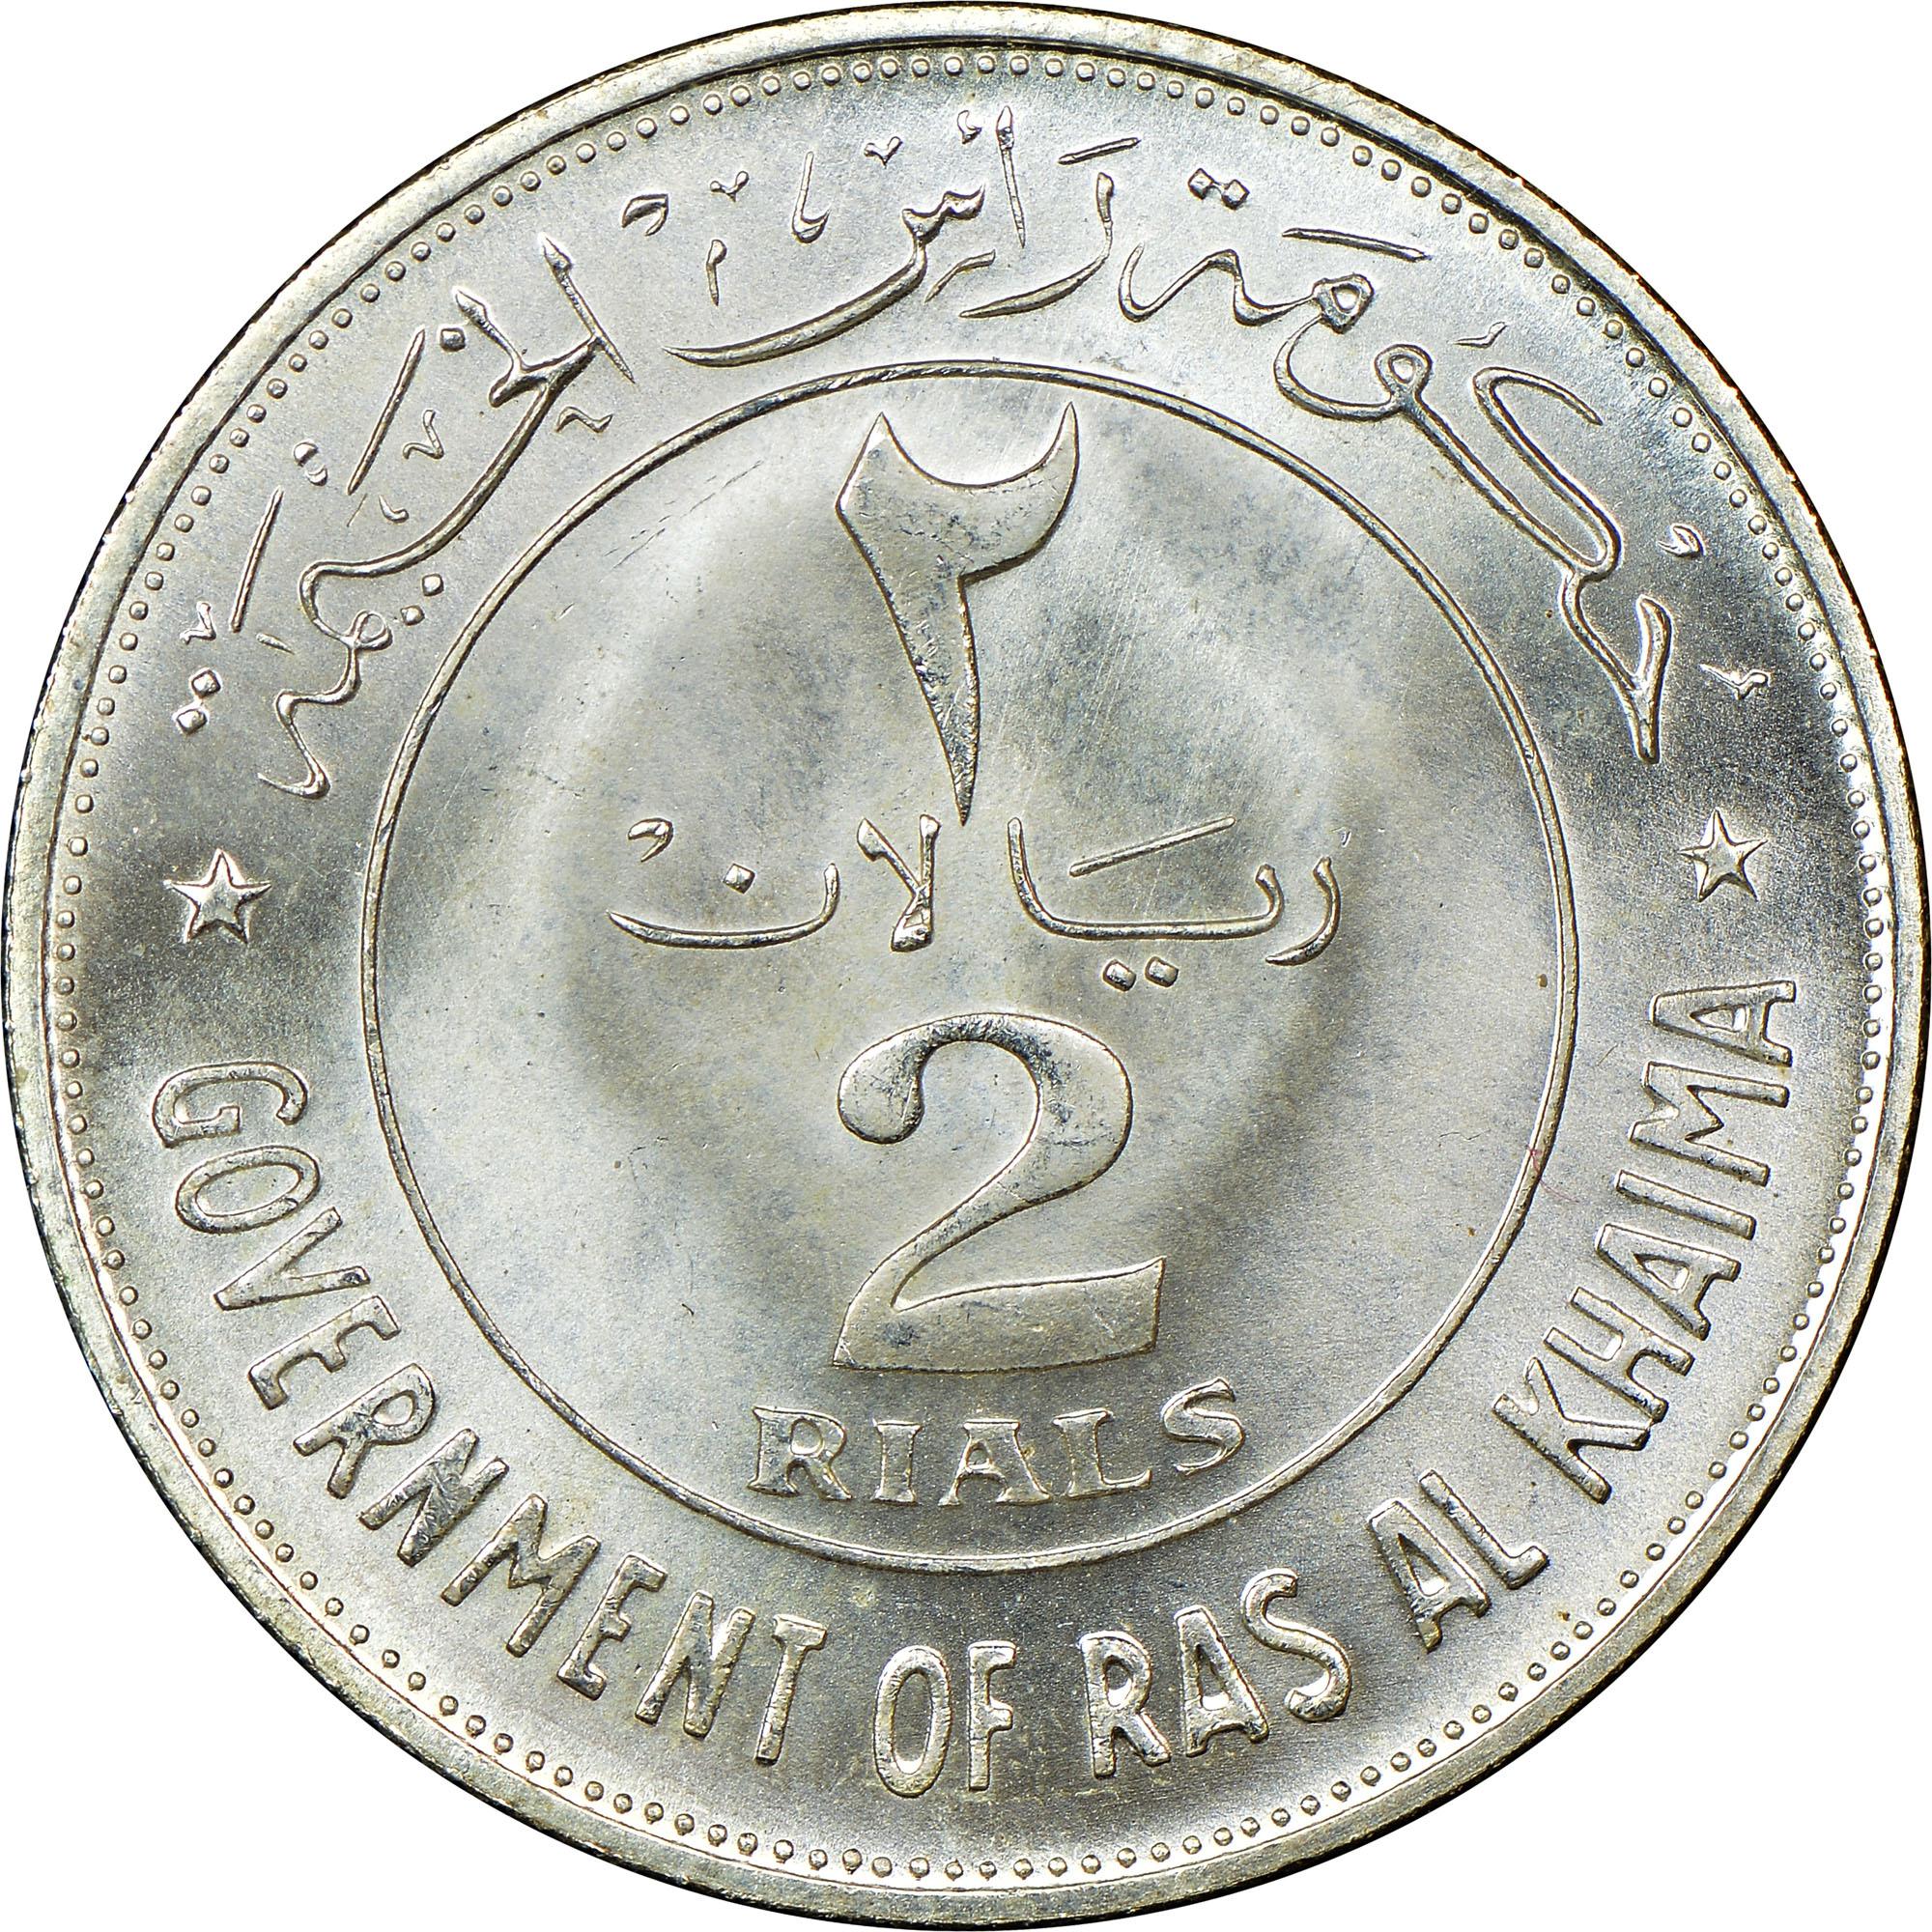 Ras Al-Khaimah 2 Rials obverse